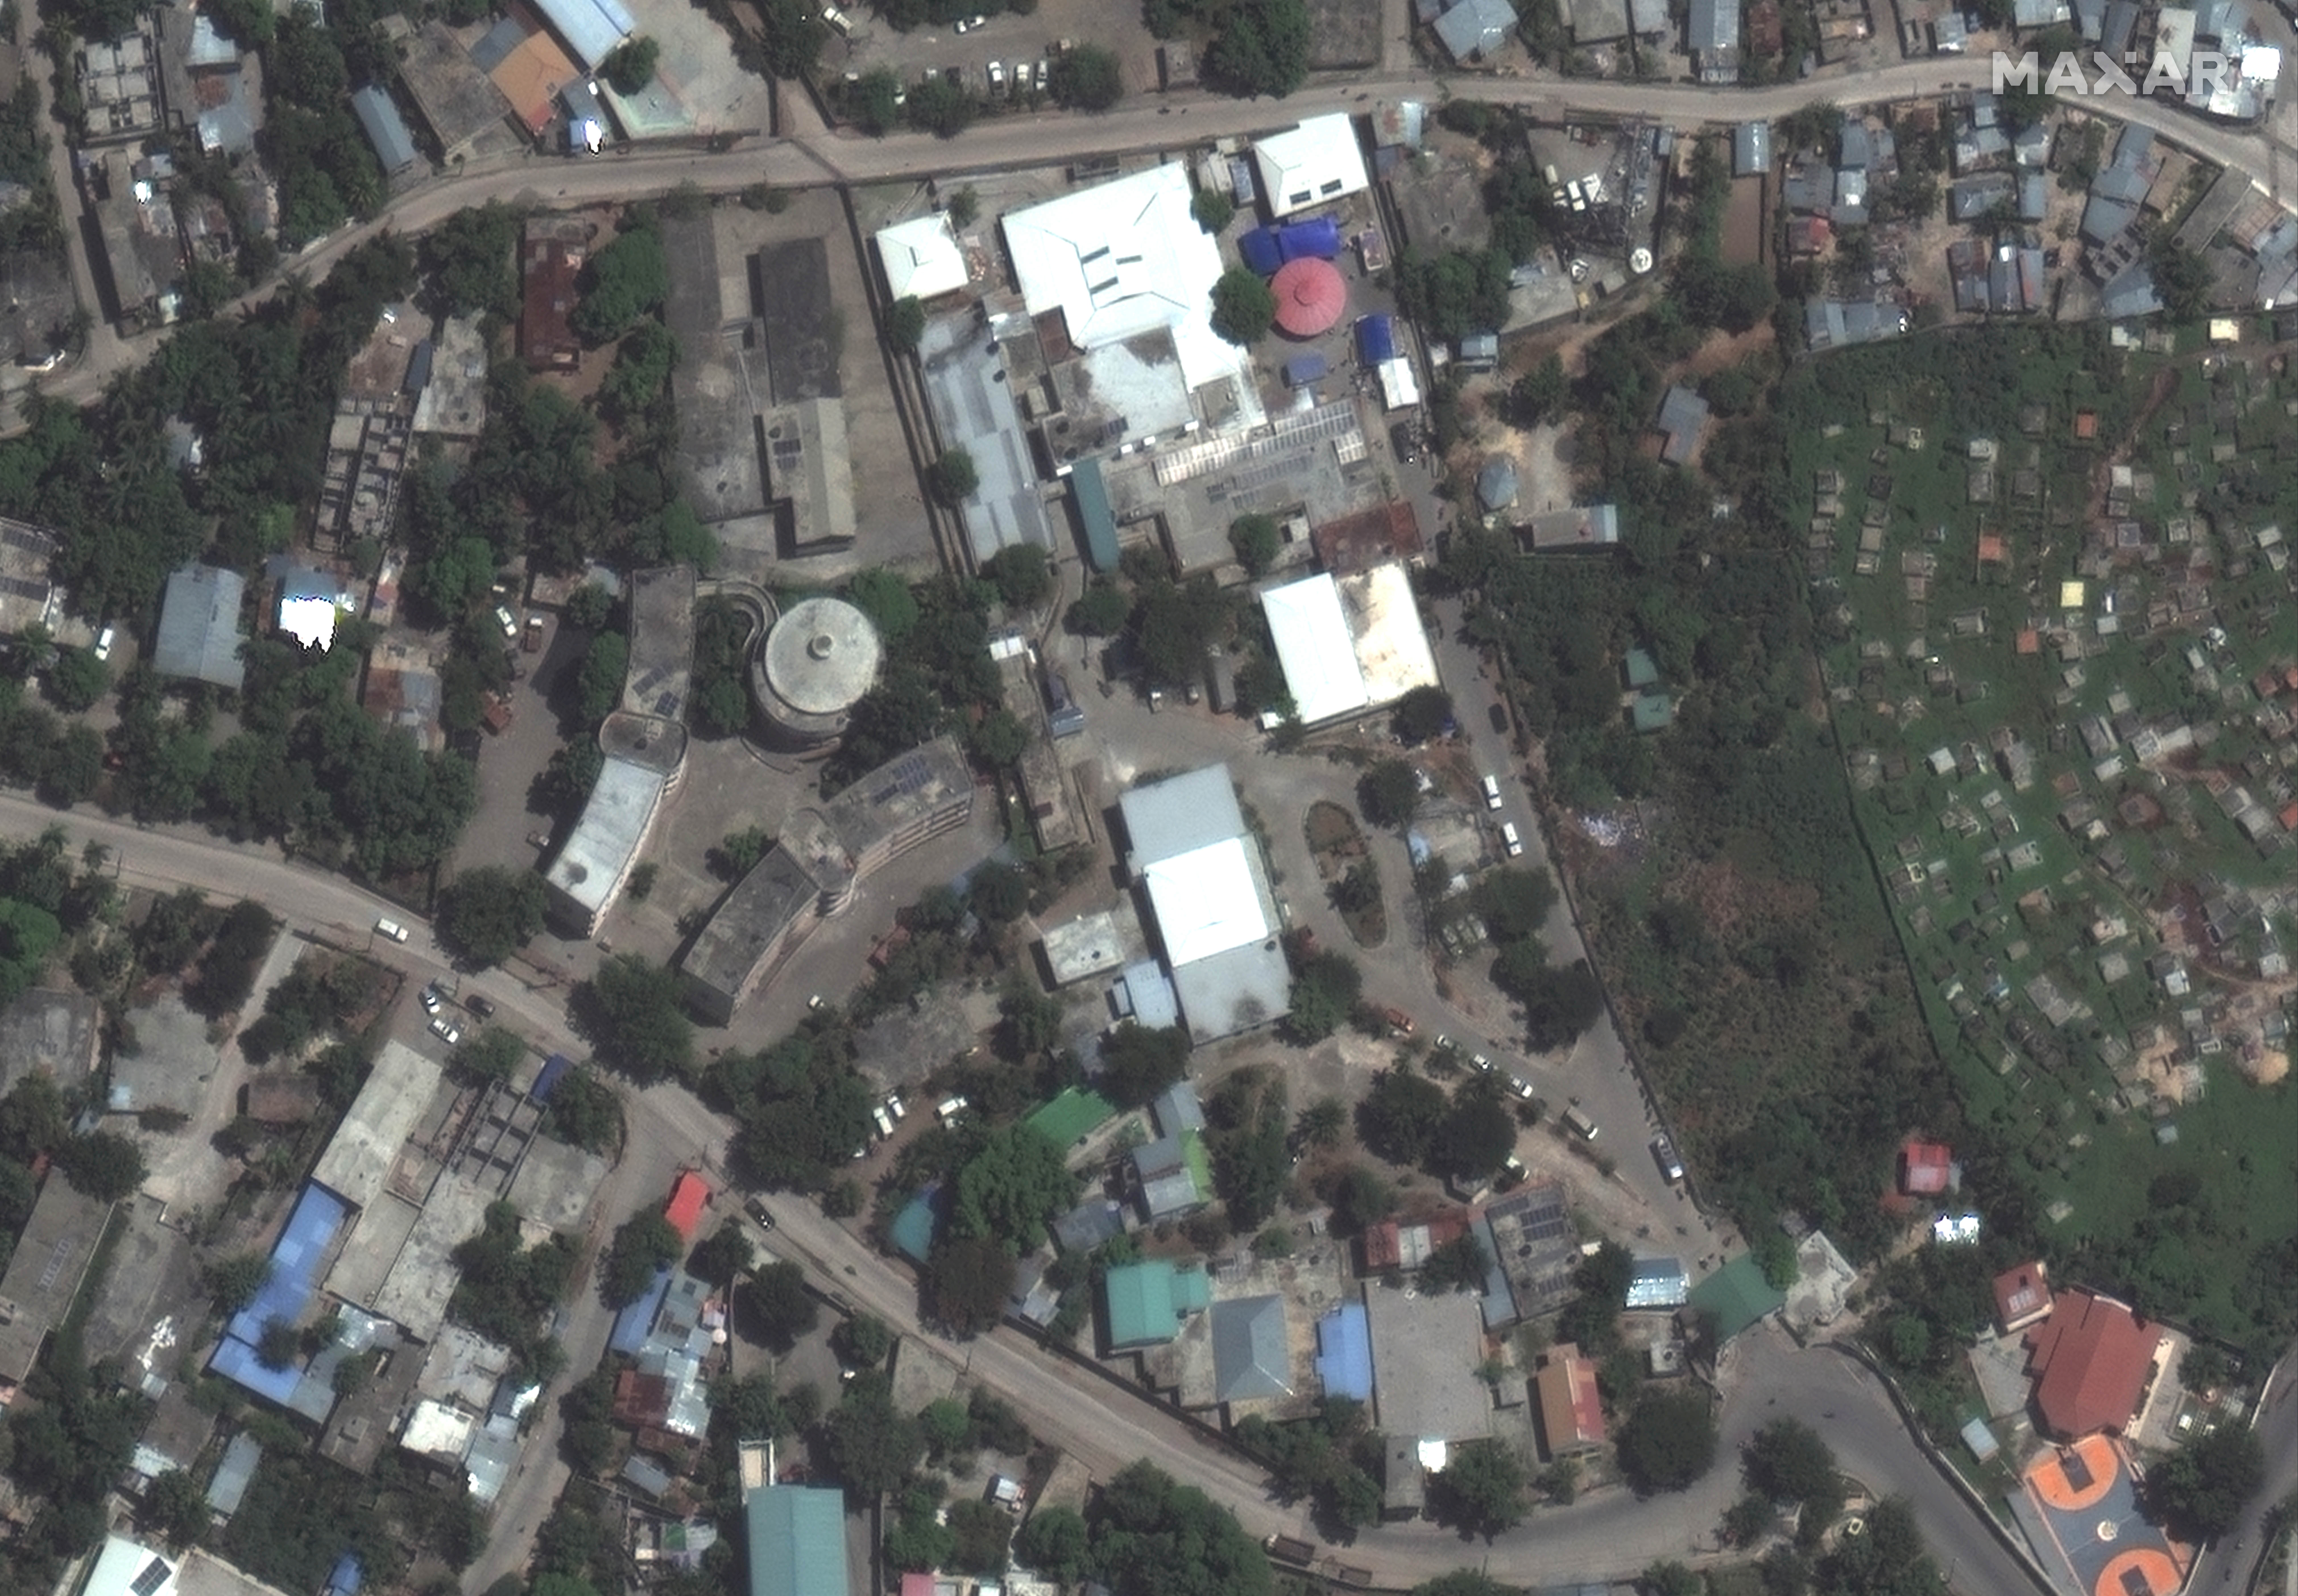 A satellite image shows the Saint Antoine Hospital in Jeremie, after a 7.2 magnitude earthquake struck Haiti, August 15, 2021. SATELLITE IMAGE 2021 MAXAR TECHNOLOGIES/Handout via REUTERS